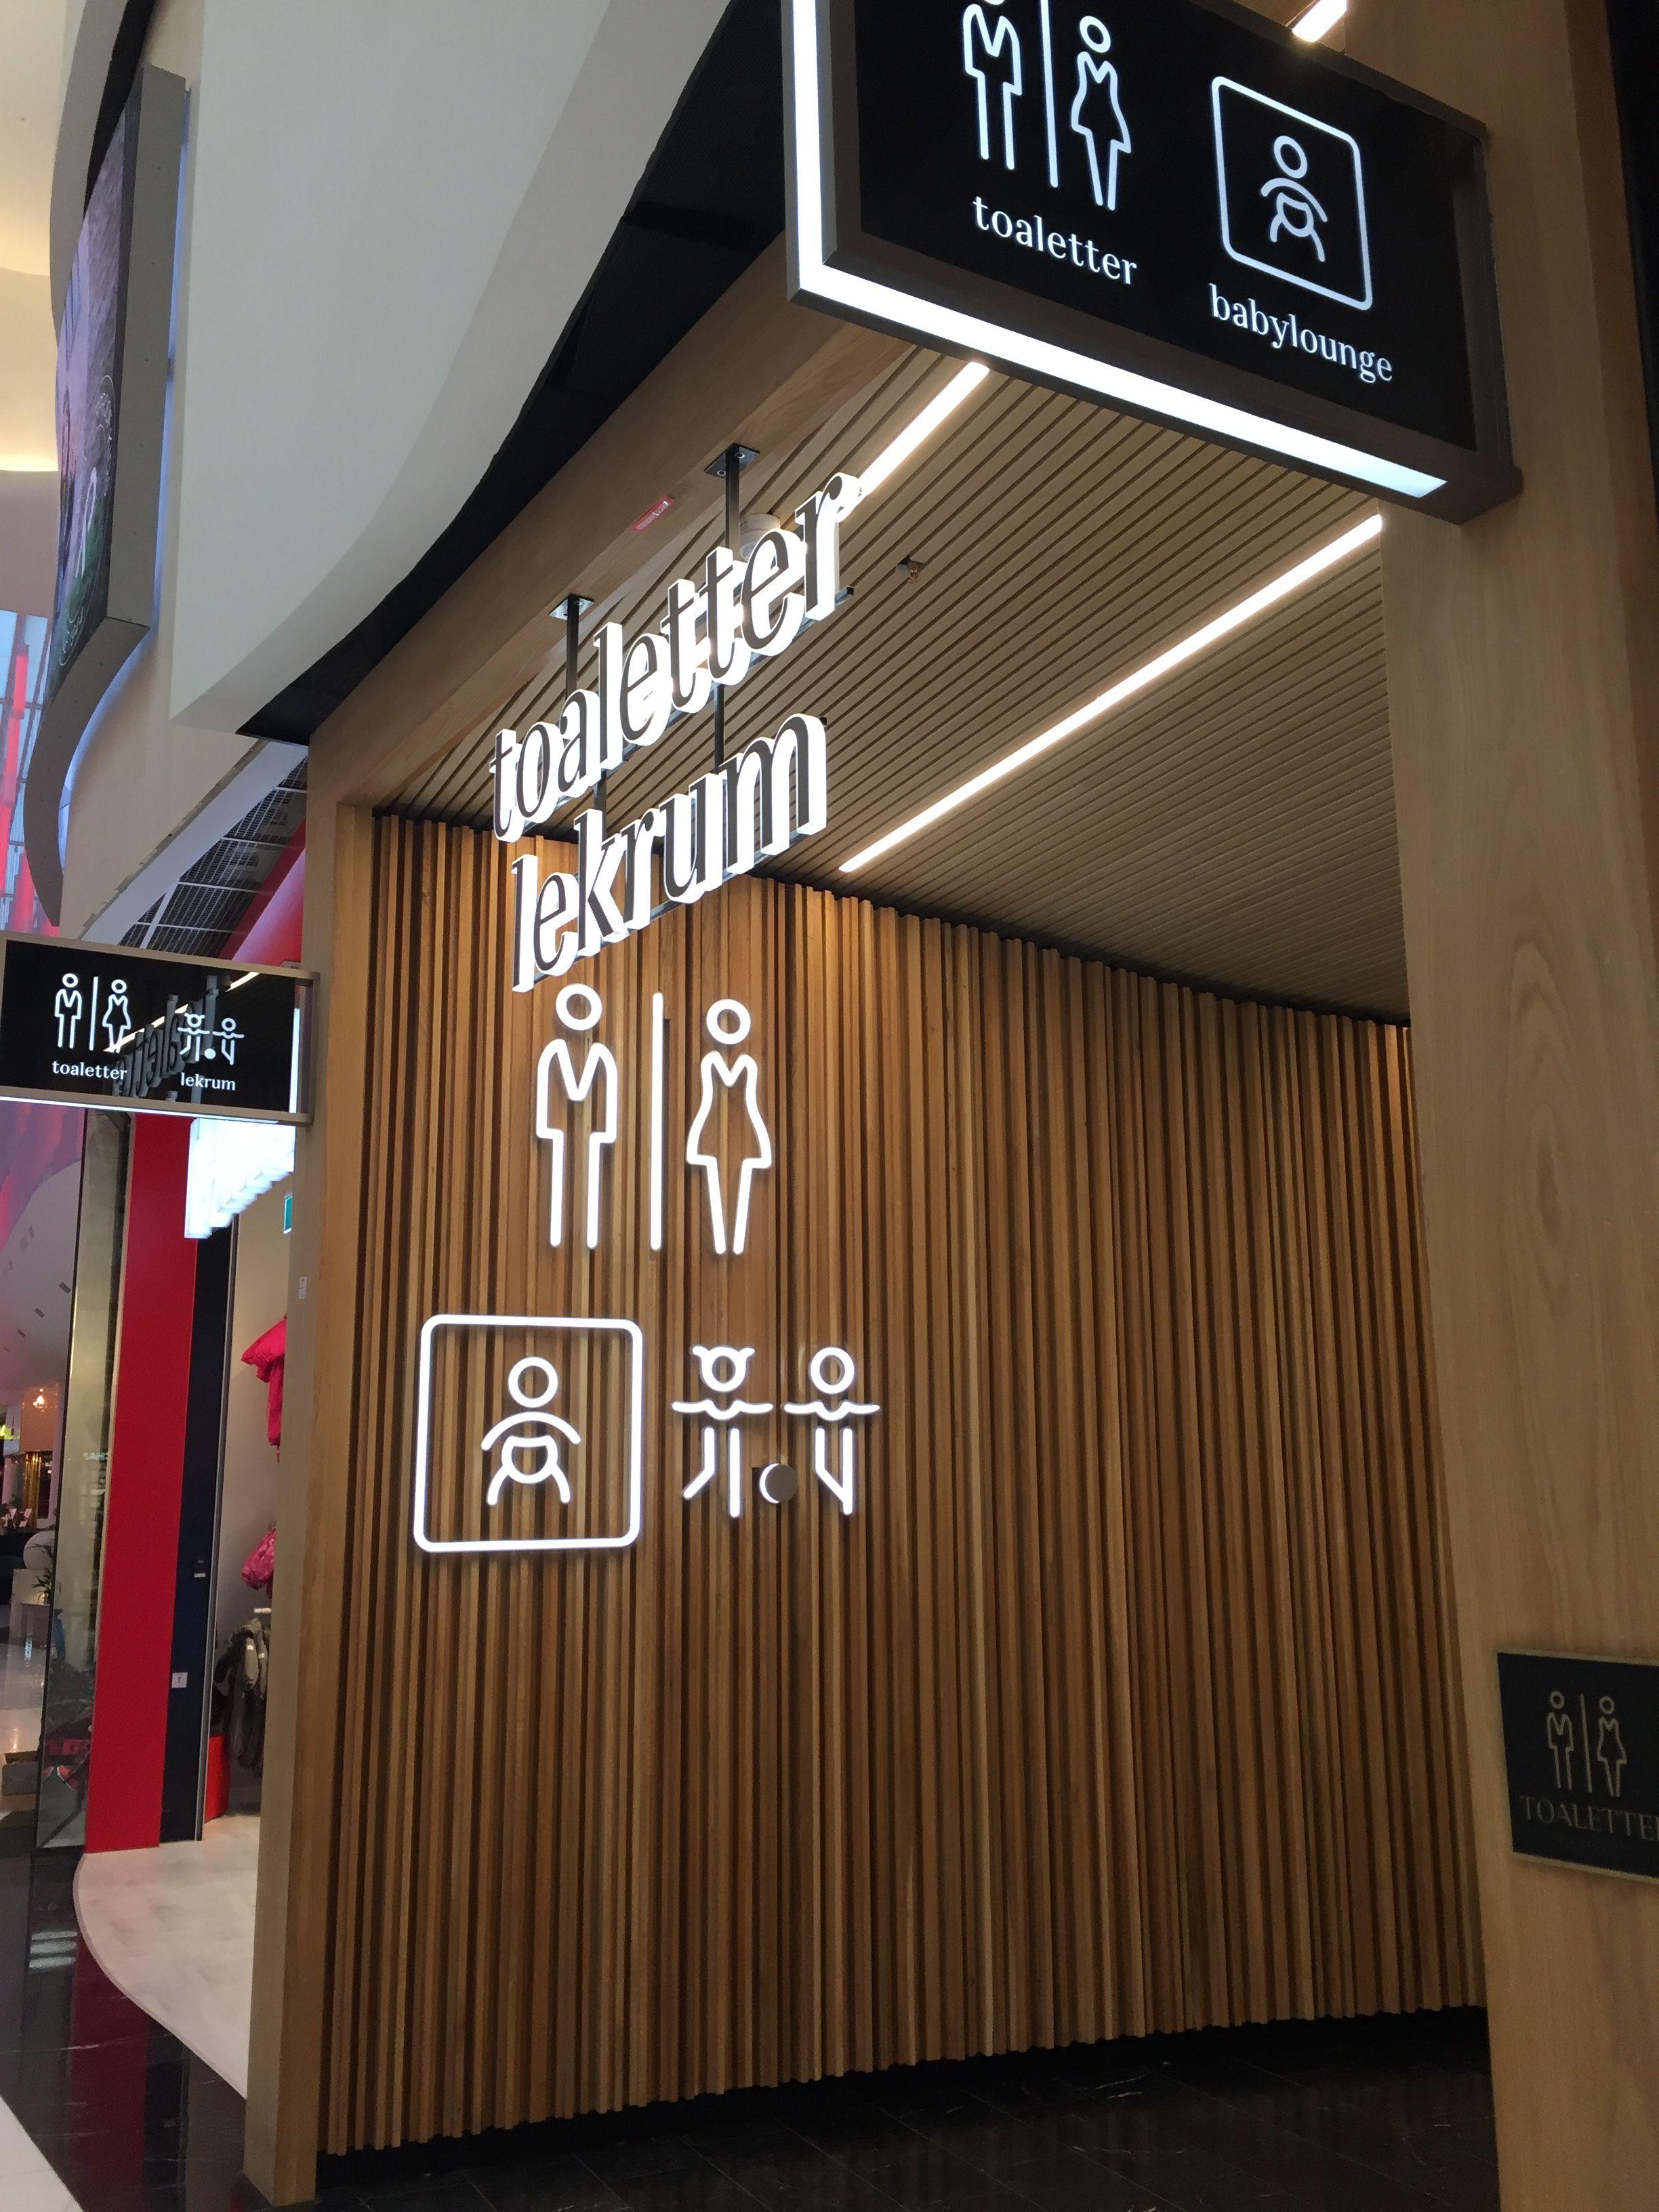 Entrance Restroom Corridor In Mall Of Scandinavia Creative Signage Design